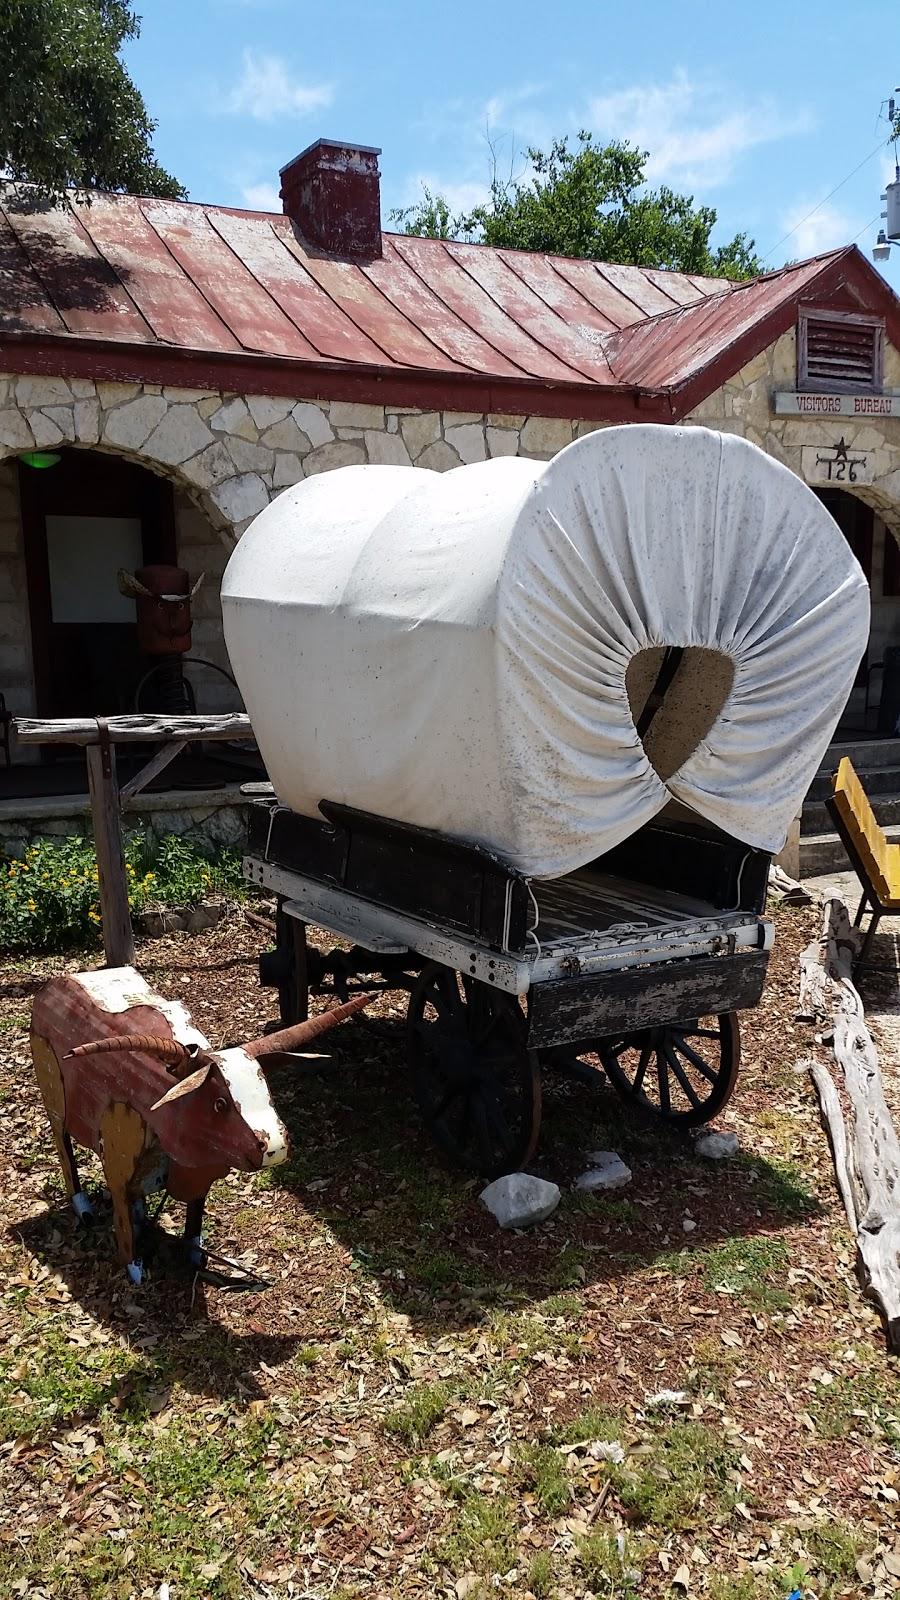 Bandera County Convention & Visitors Bureau - travel agency  | Photo 2 of 10 | Address: 126 TX-16, Bandera, TX 78003, USA | Phone: (830) 796-3045